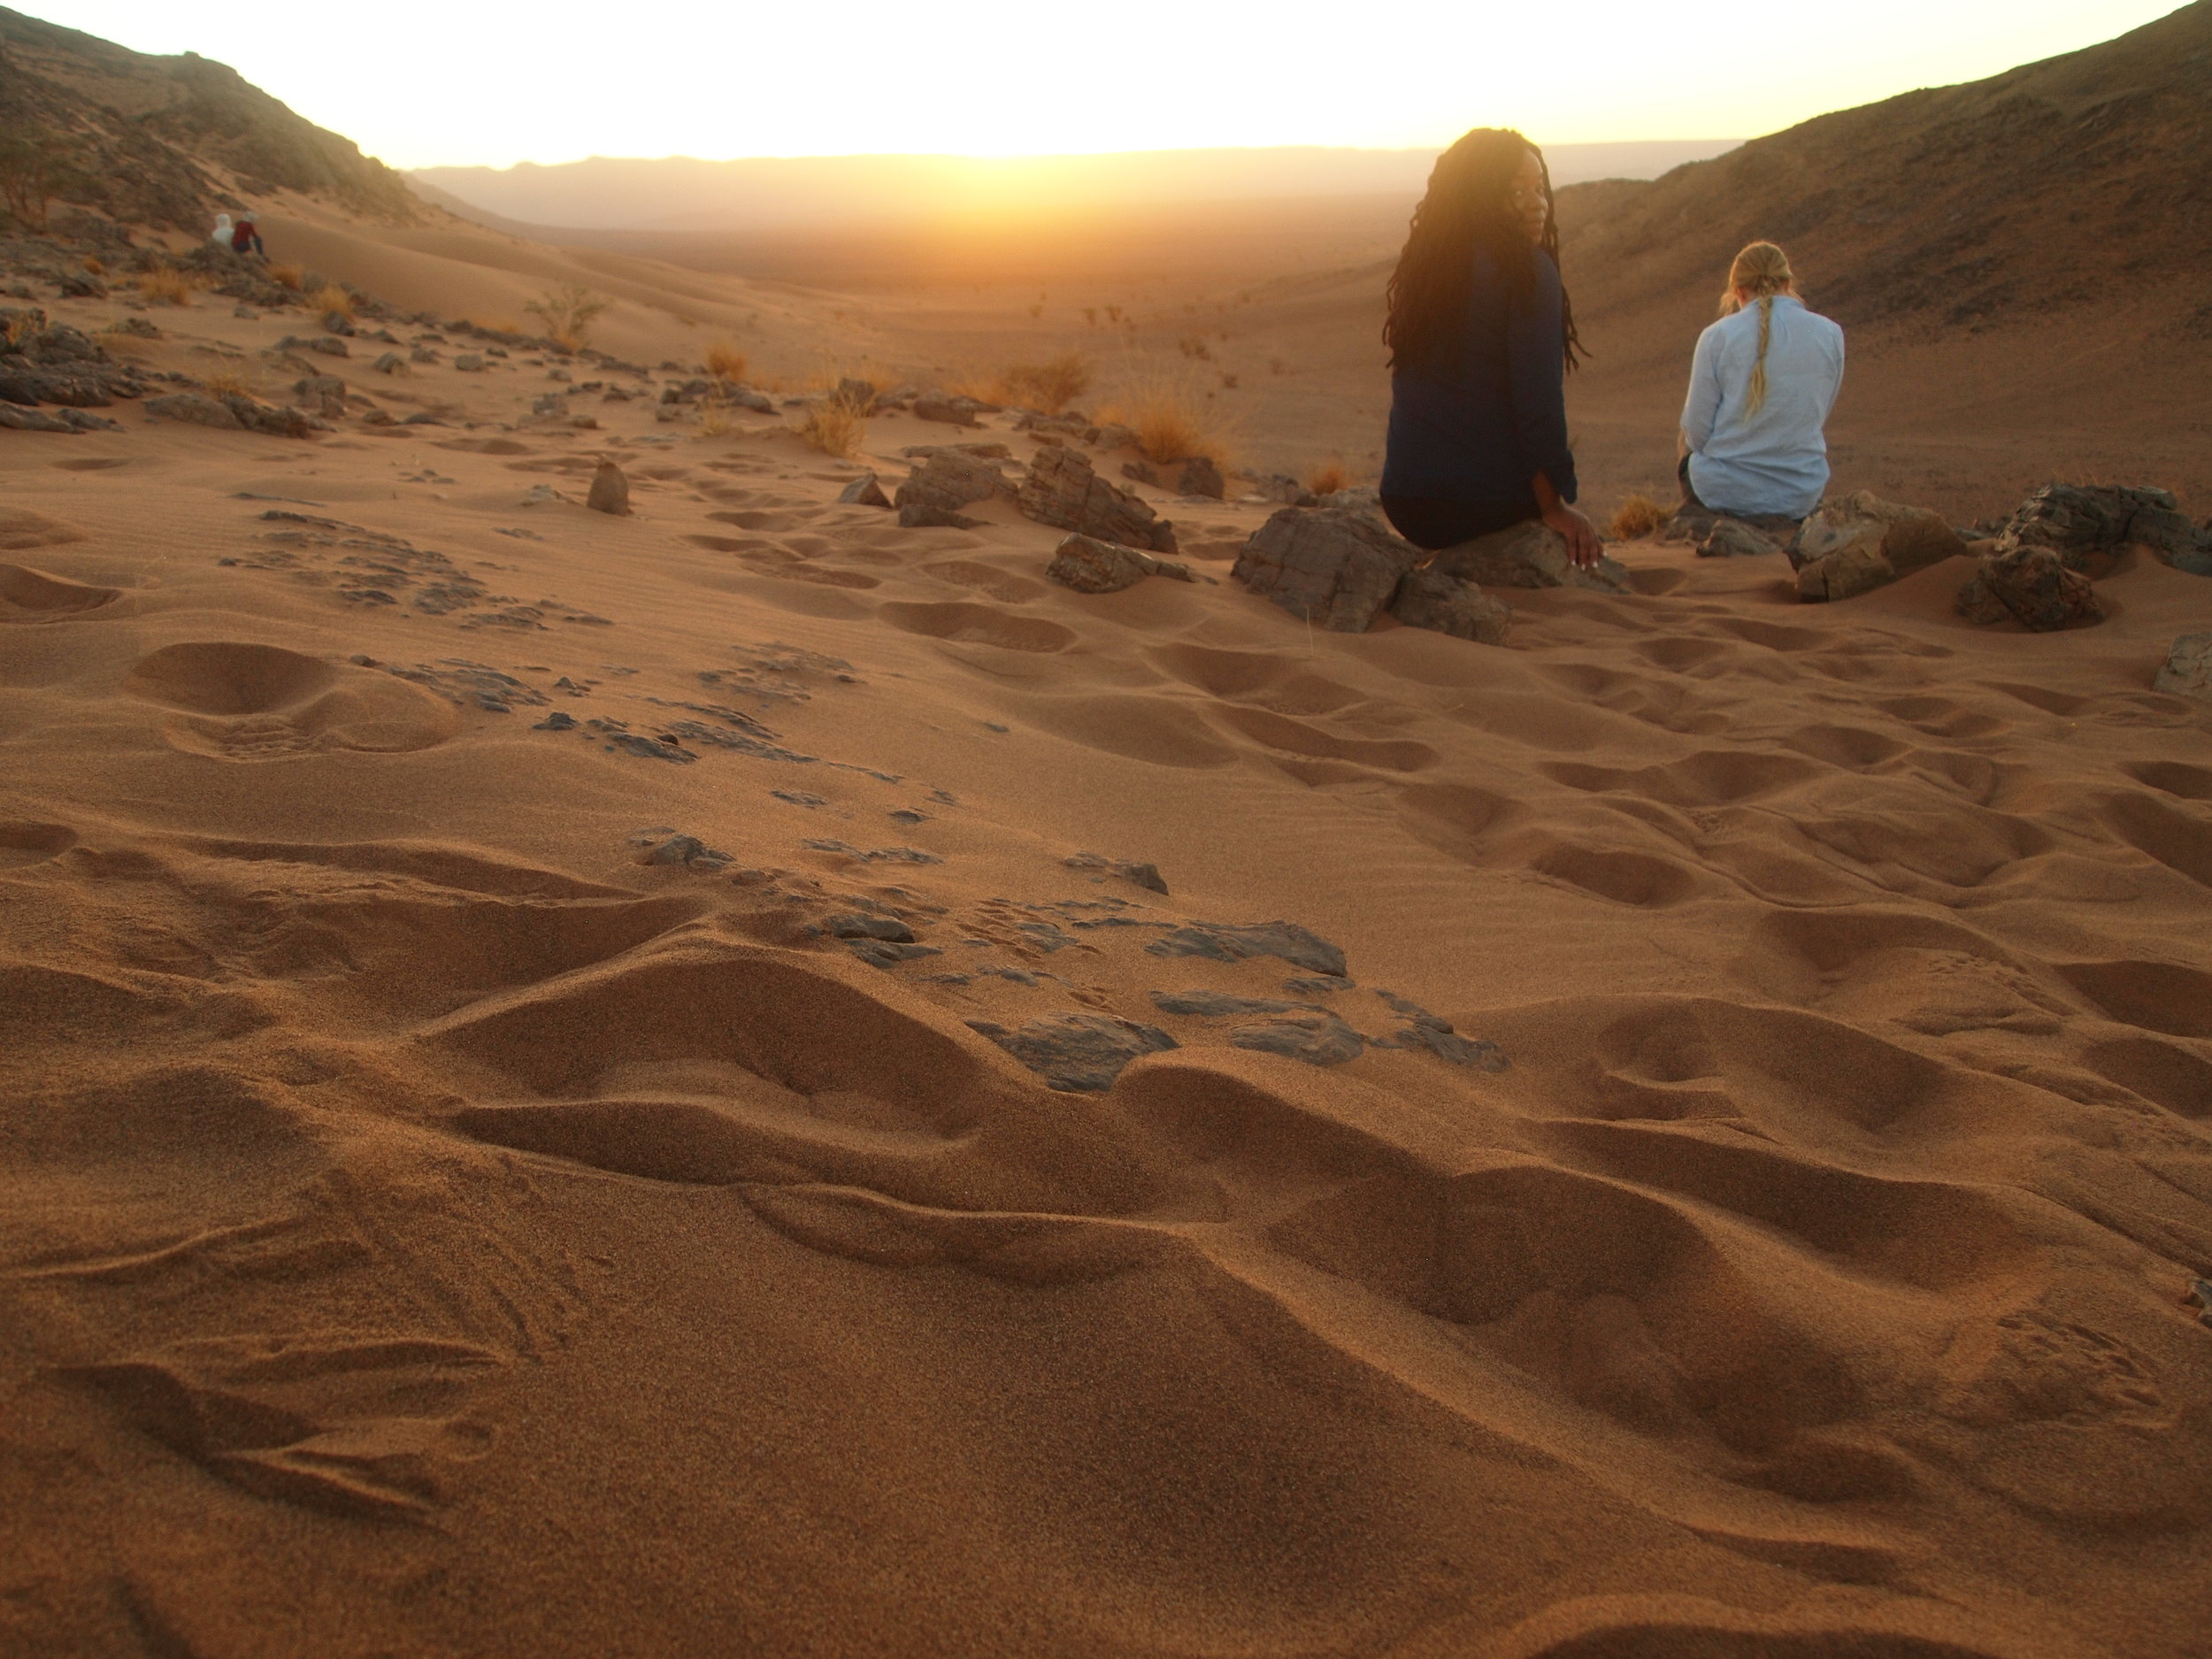 City: Zagora Desert  The Journey - Camp site